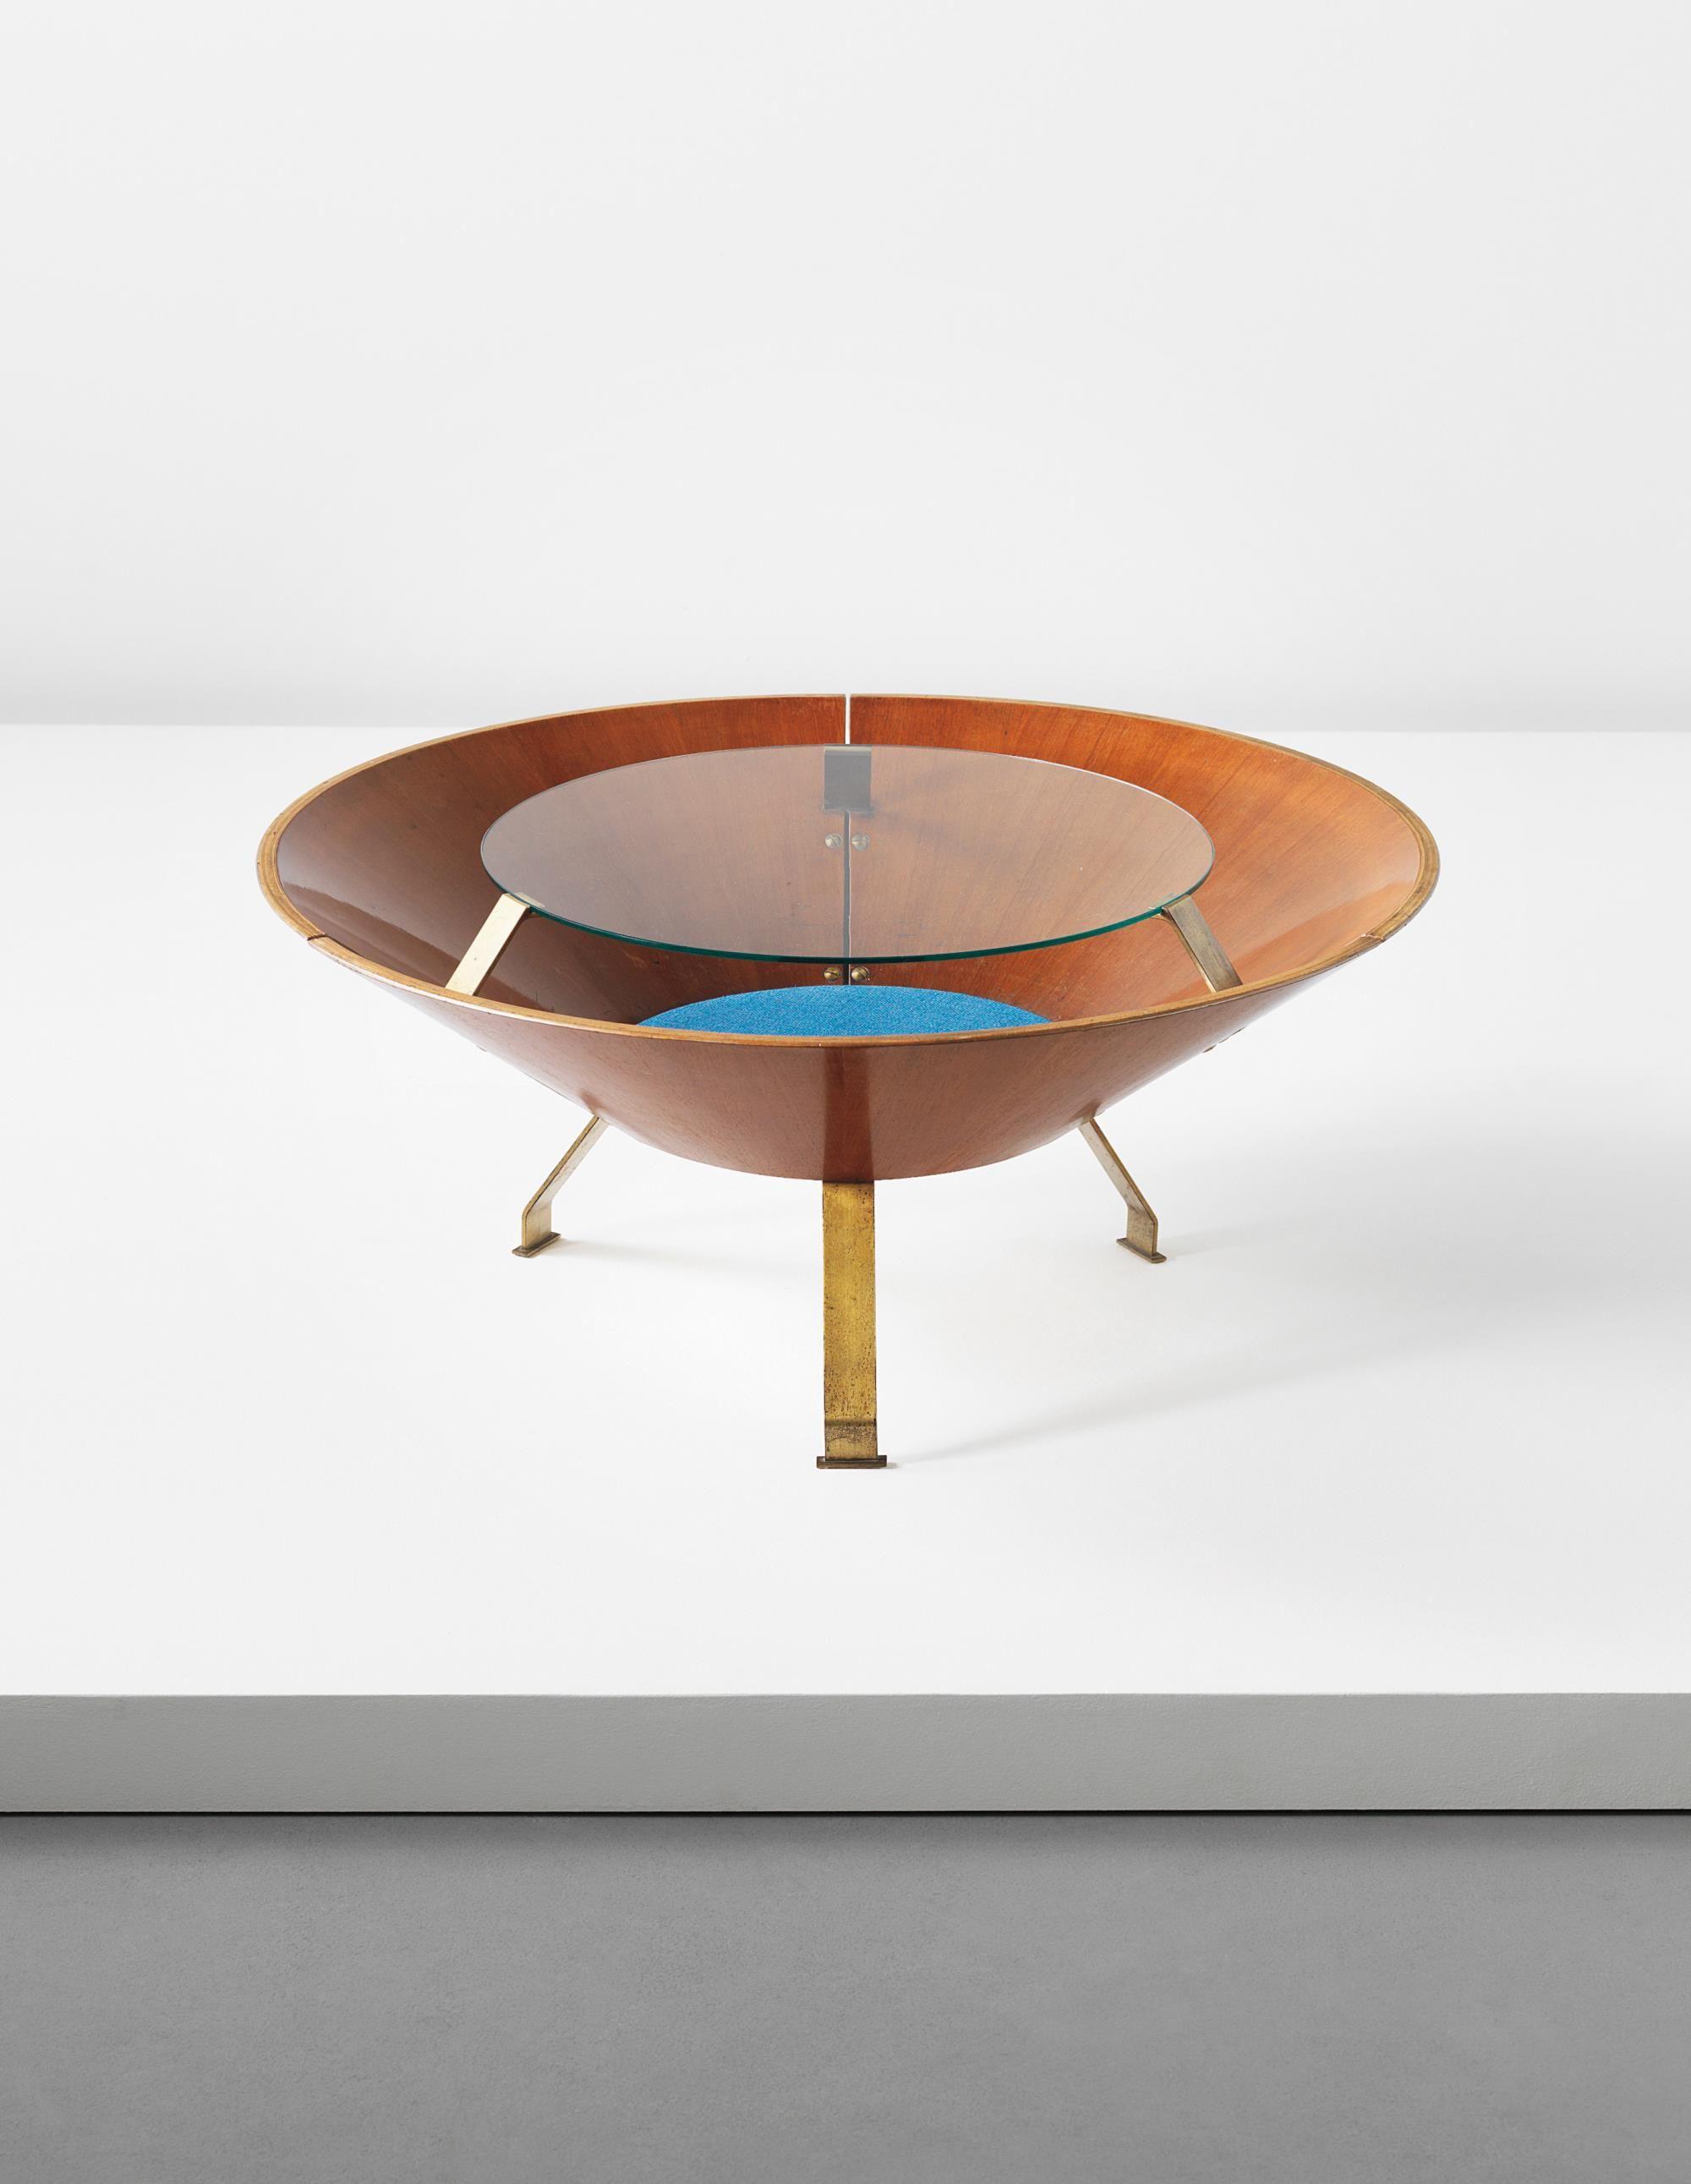 Gianfranco Frattini, Coffee table